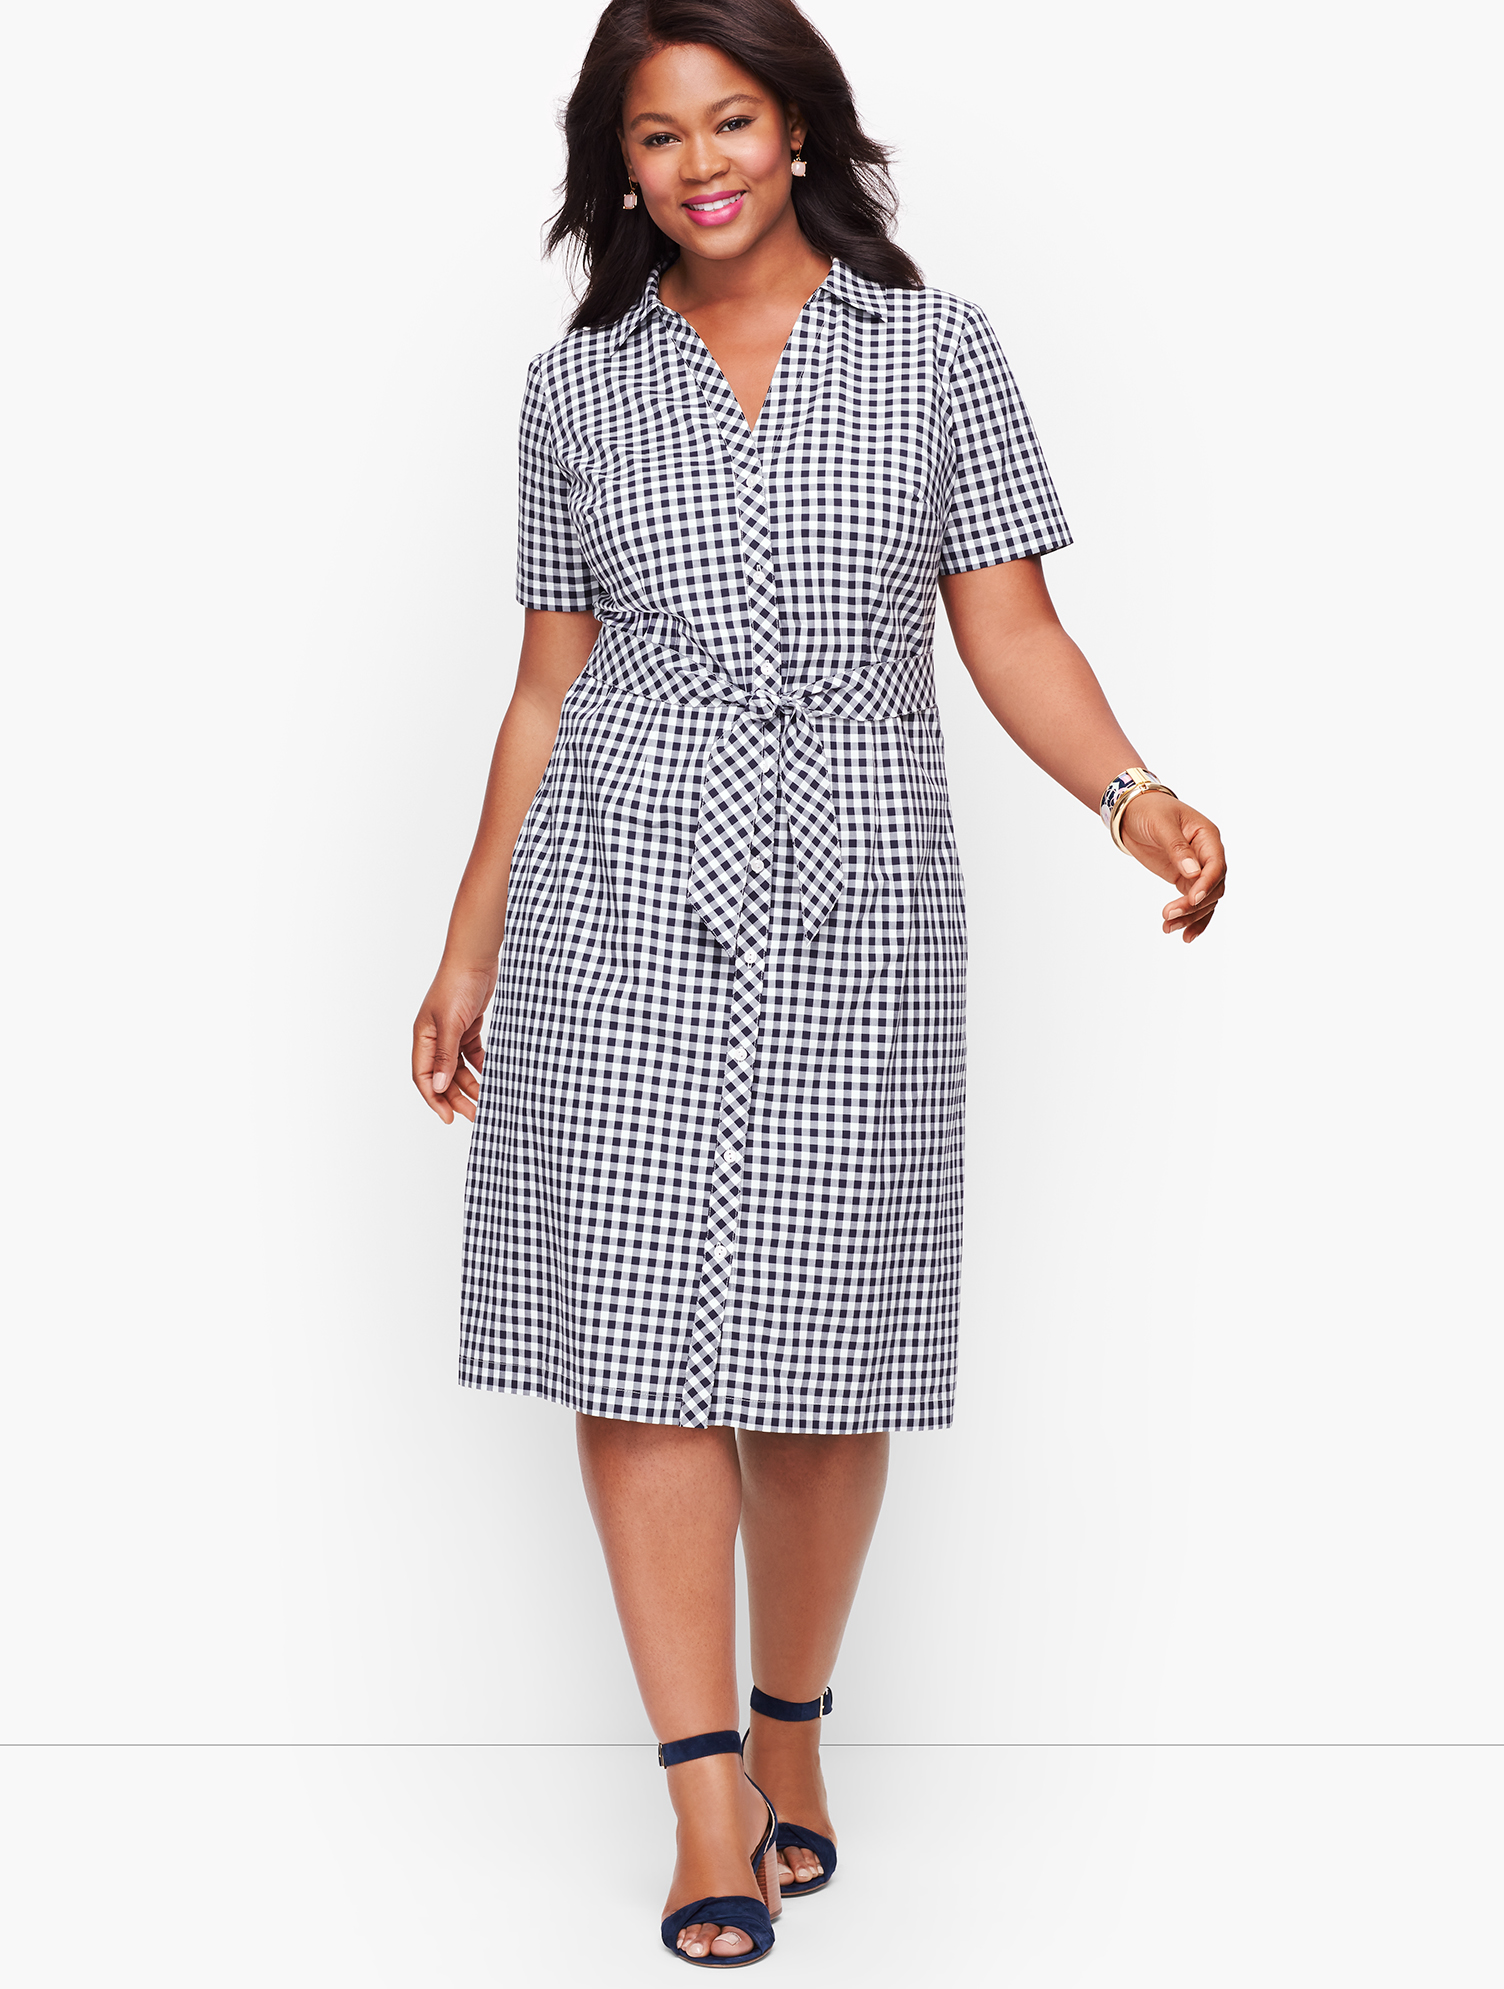 1920s Day Dresses, Tea Dresses, Mature Dresses with Sleeves Plus Size Exclusive A-Line Dress - Gingham - Blue - 22 - 100 Cotton Talbots $129.00 AT vintagedancer.com